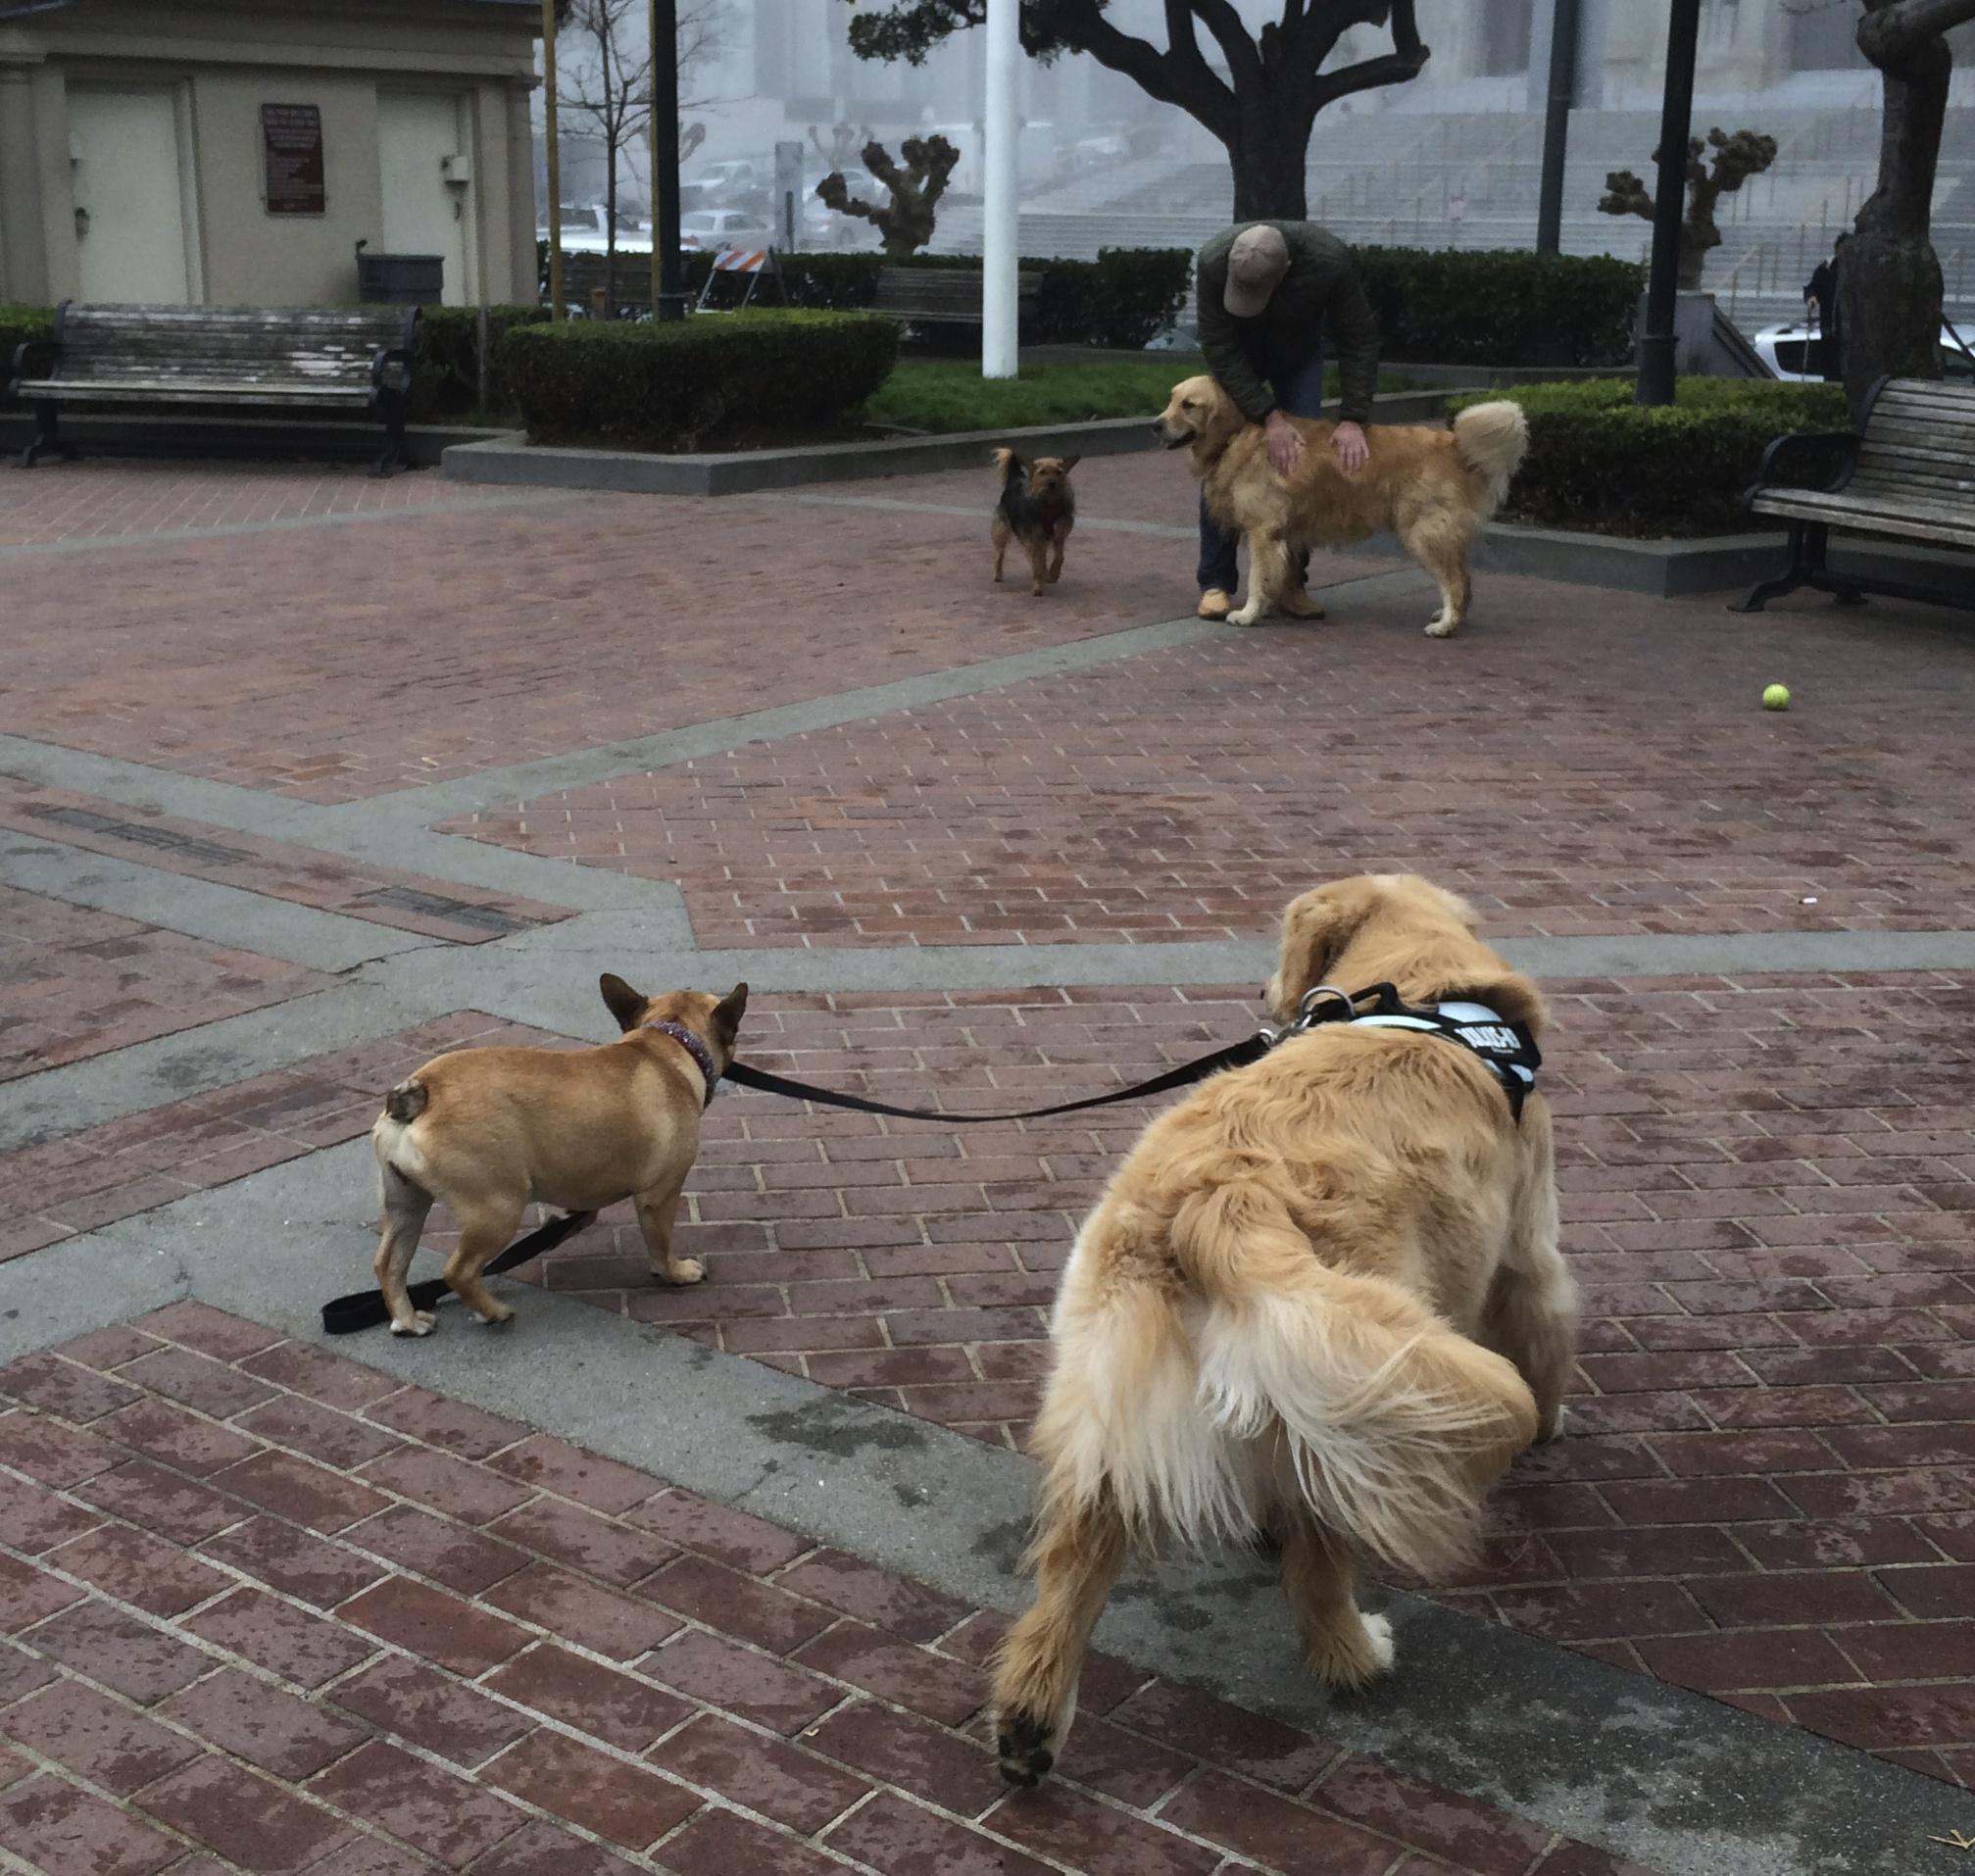 Boston Terrier Taking a Golden Retriever For a Walk